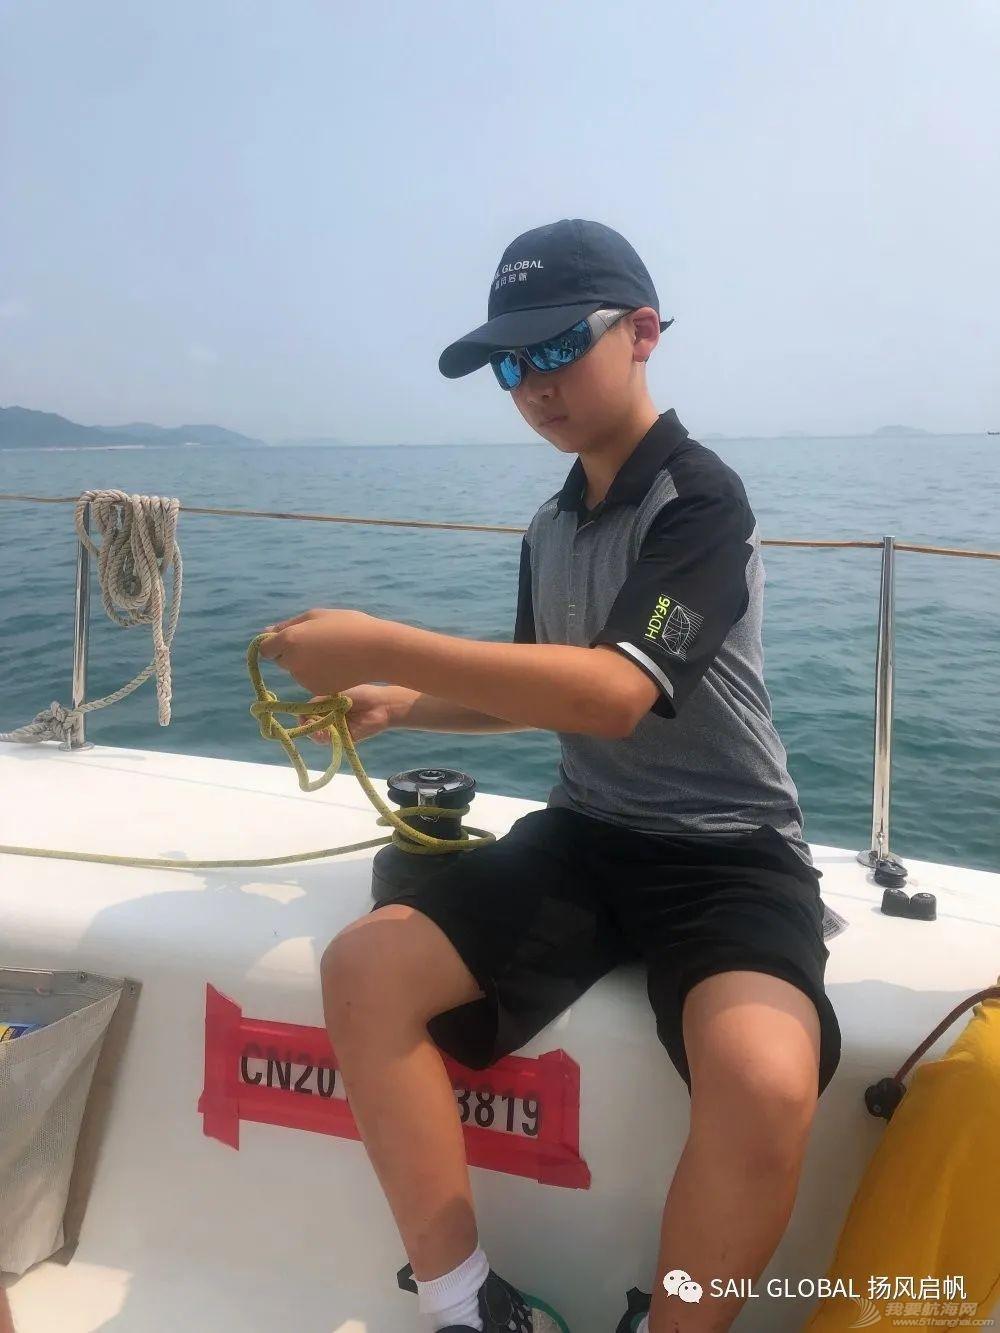 SAIL GLOBAL深圳亲子帆船课:扬帆逐梦,陪伴成长w8.jpg